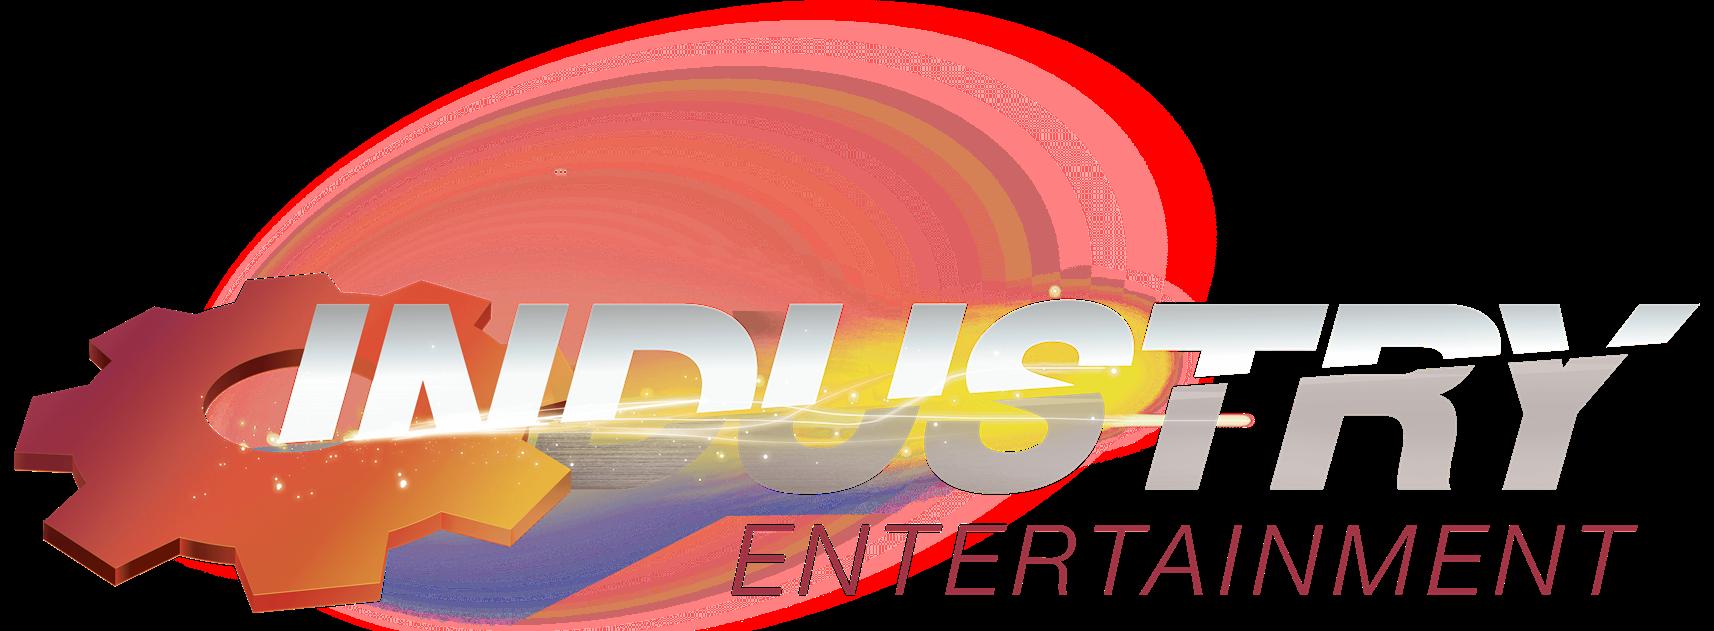 Industry Entertainment